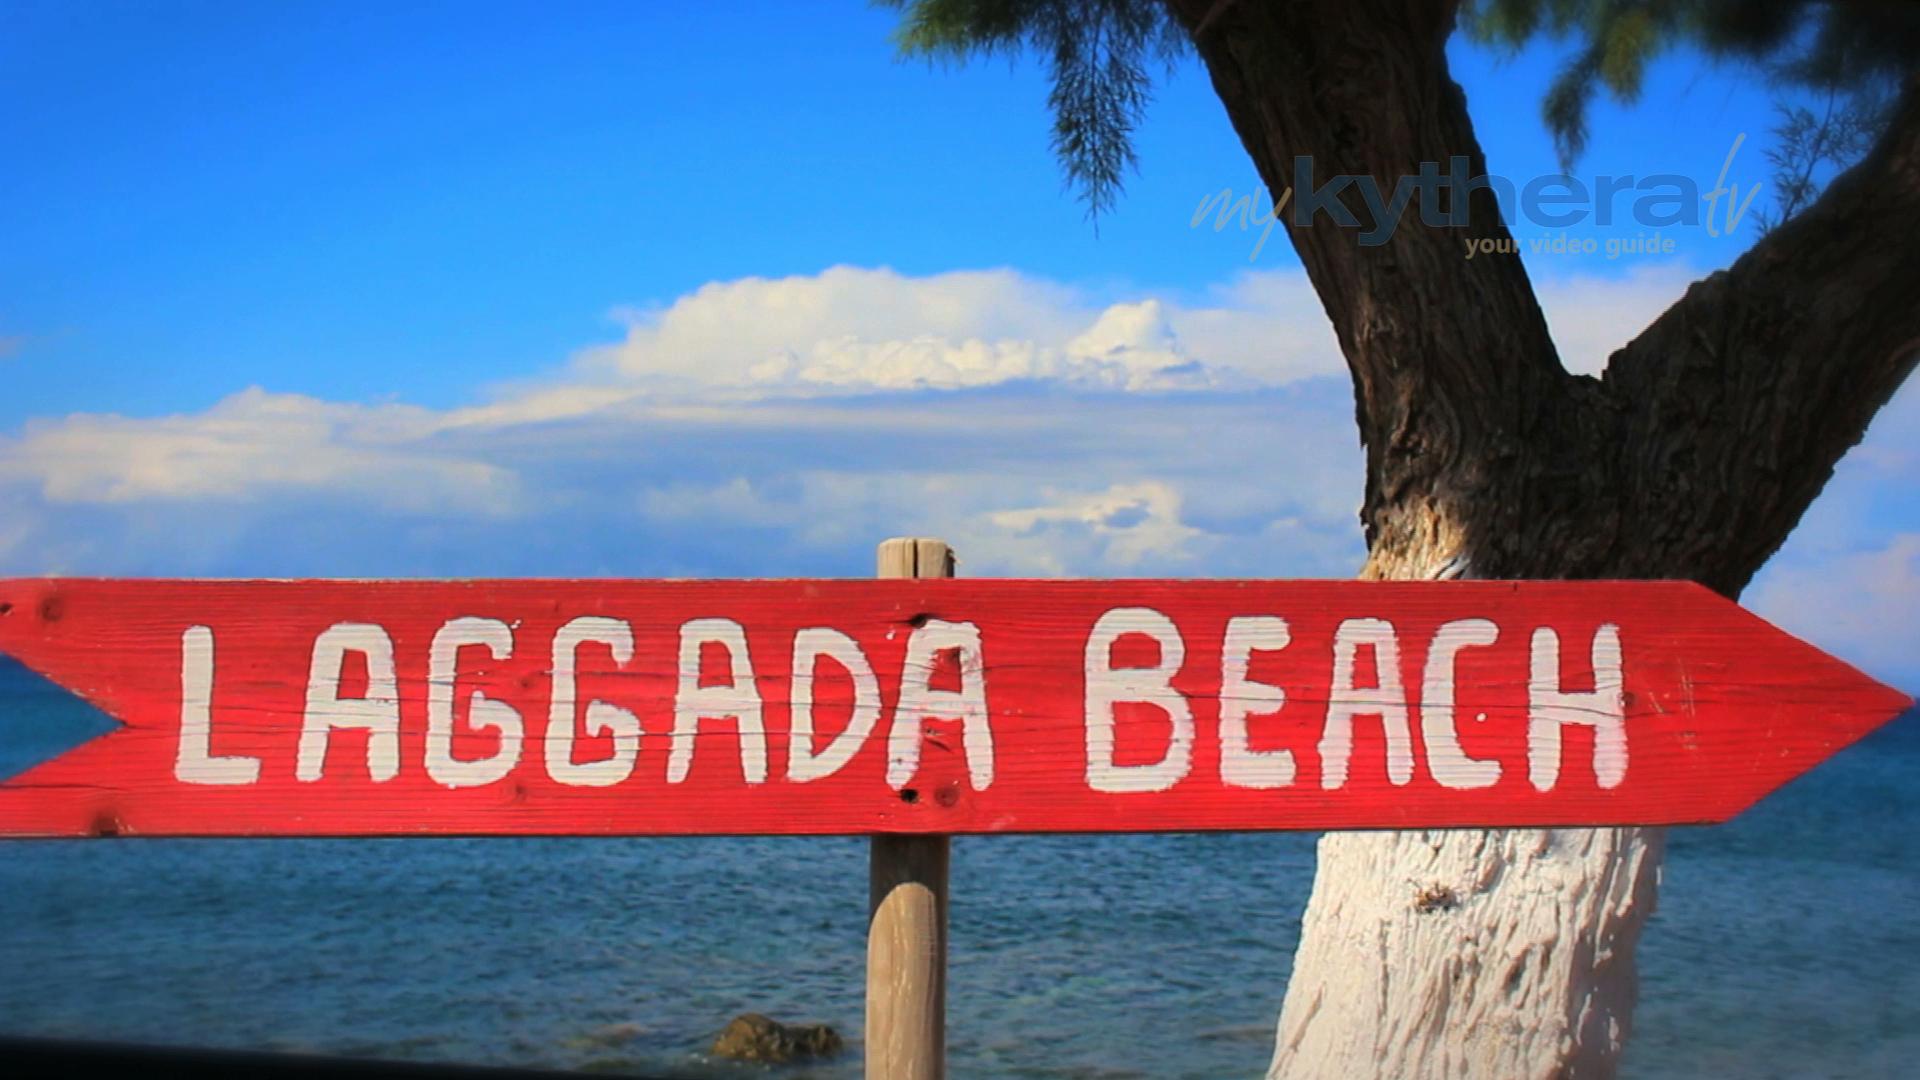 Kakia Lagada Beach